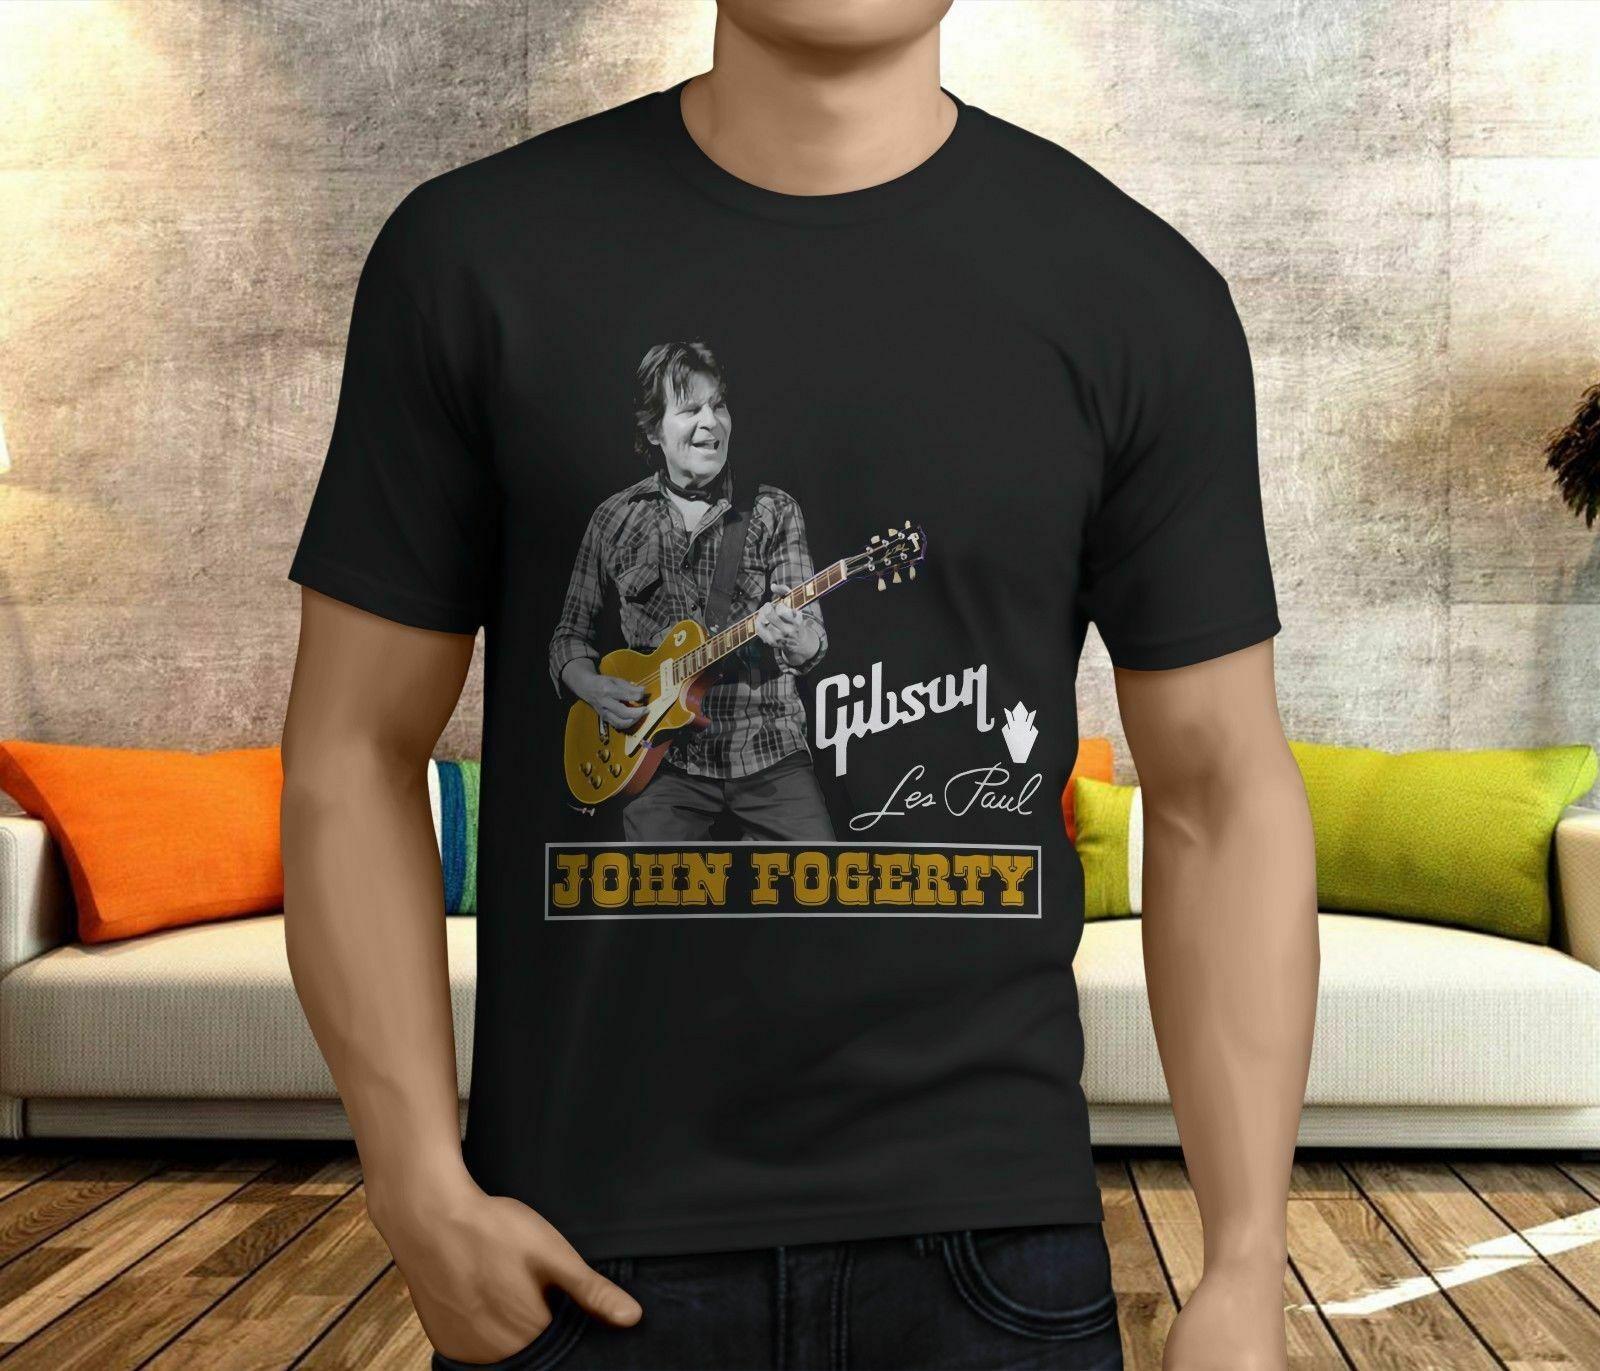 Nuevo John Fogerty Creedence Clearwater, camiseta negra para hombre, talla S, M, L, 234Xl, Kl206